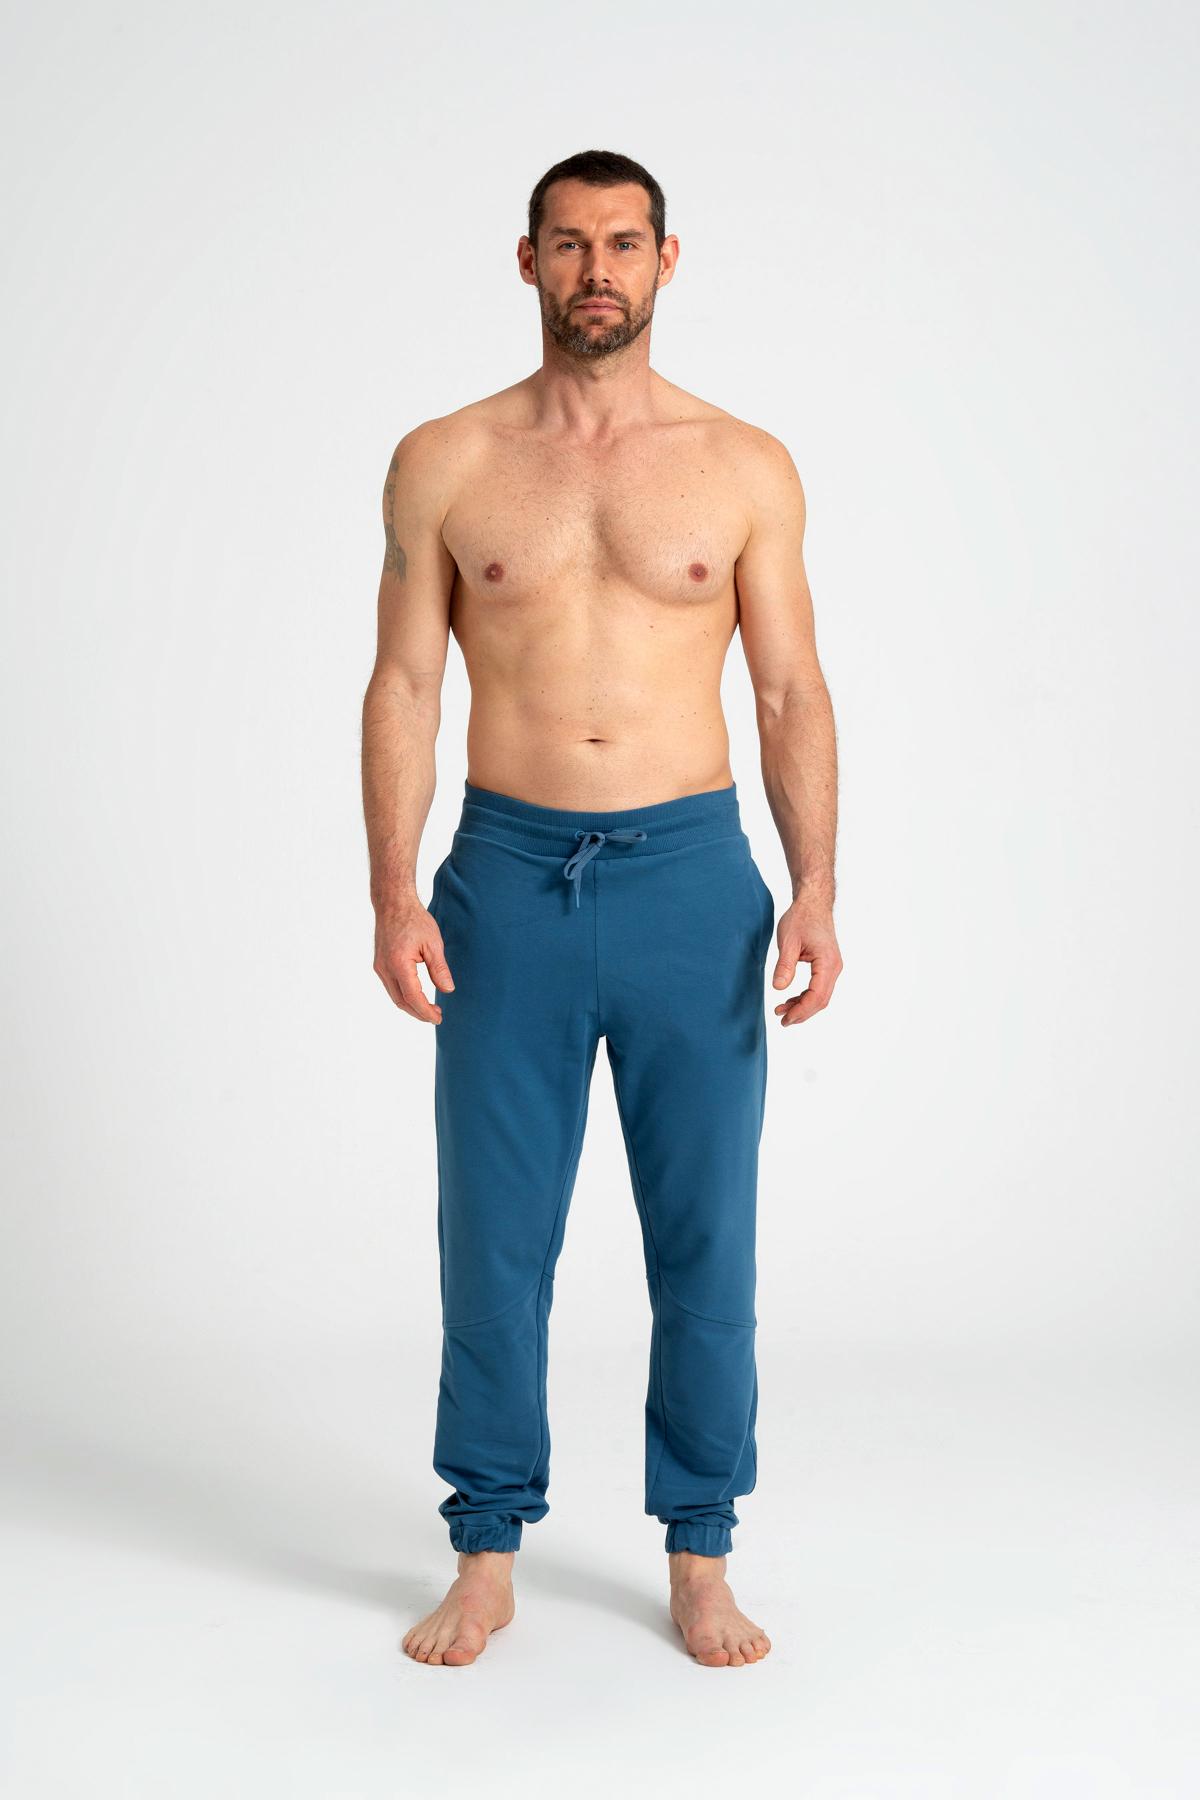 Ribana Waist Men's Sweatpants newces-5012-BL